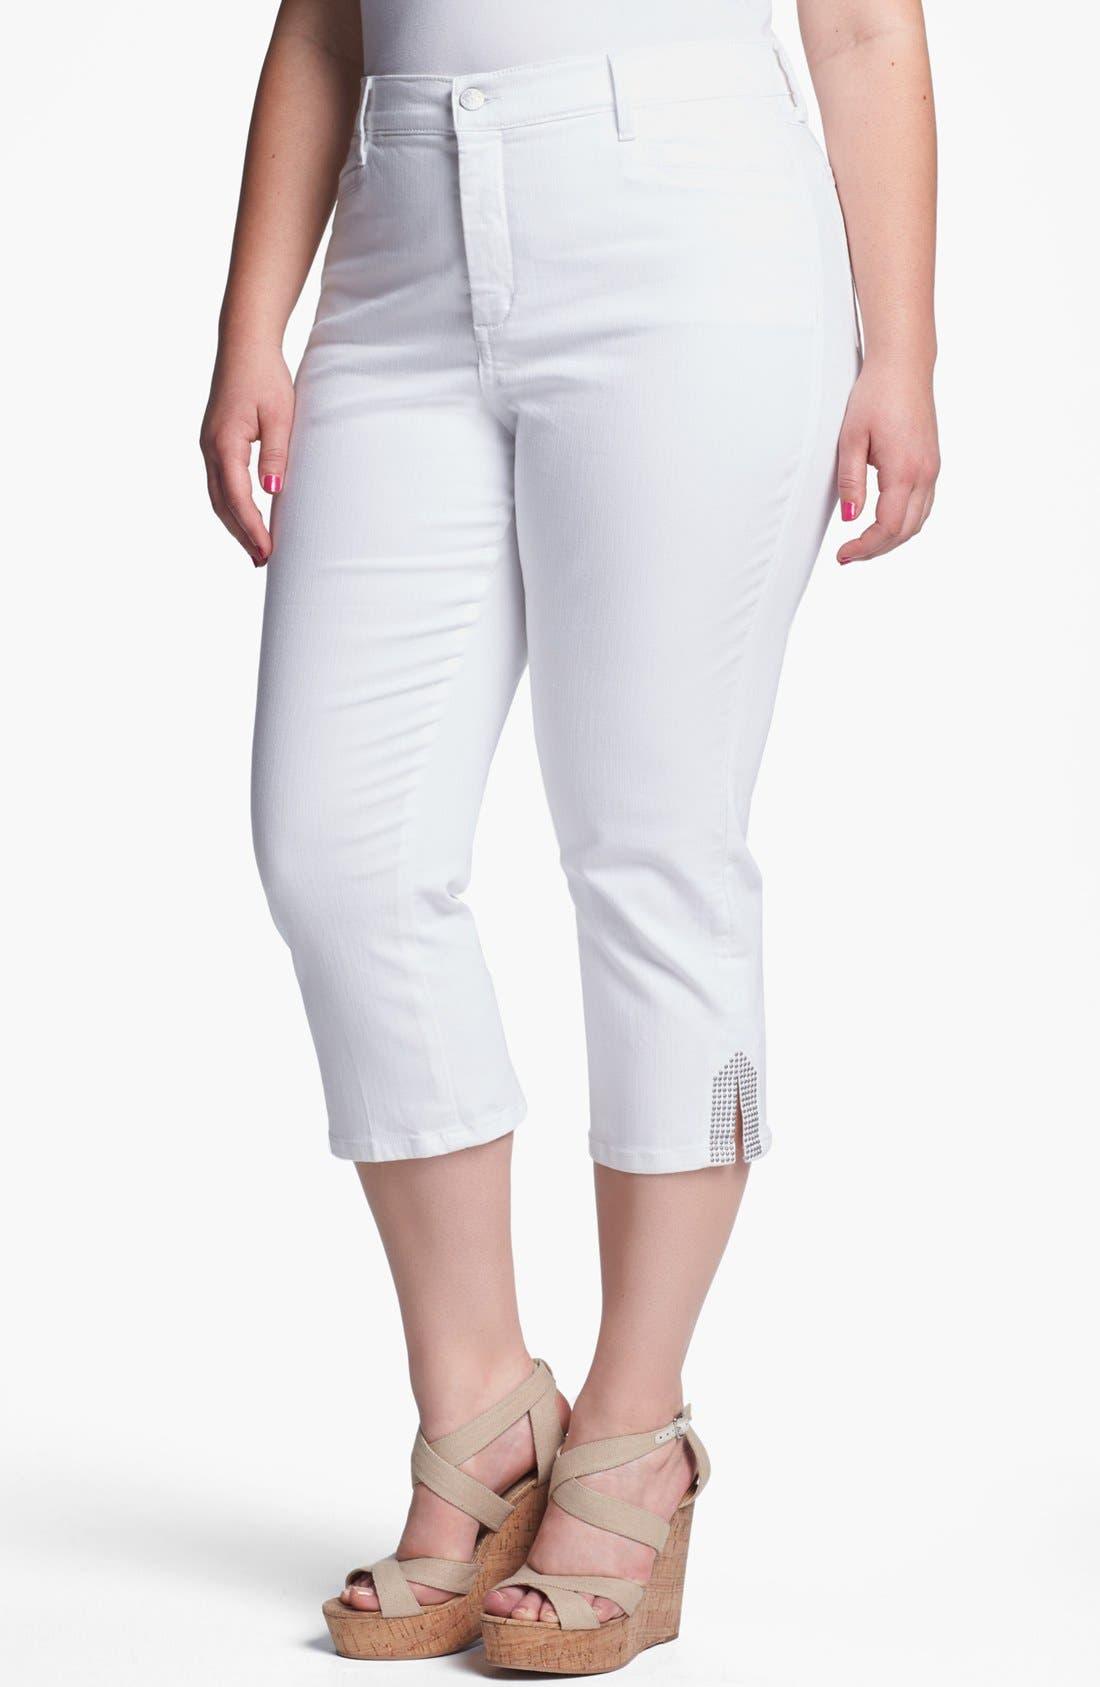 Main Image - NYDJ 'Suzy' Crop Jeans (Plus Size)